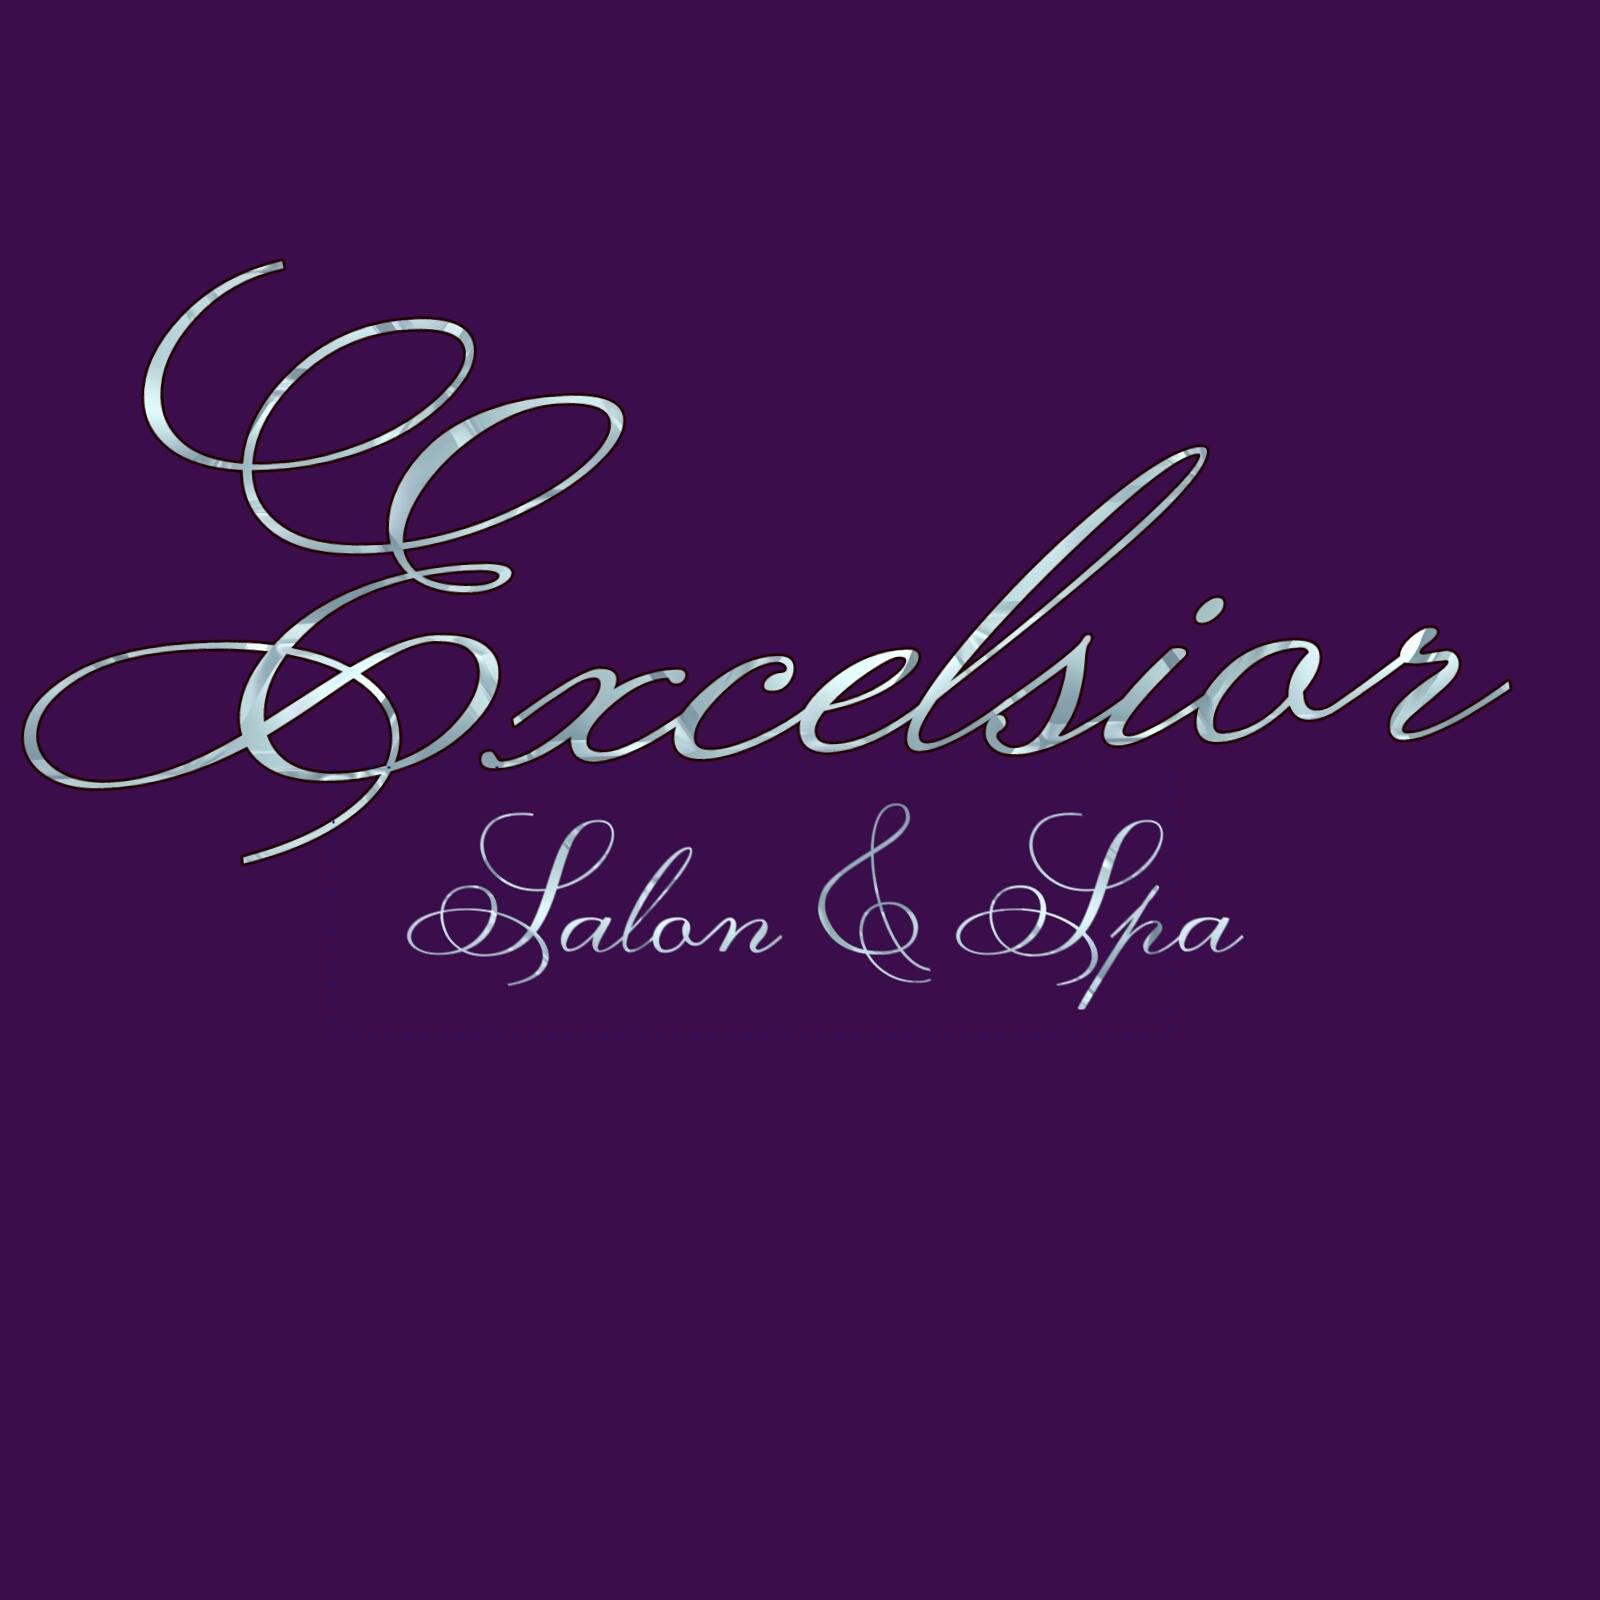 Excelsior Salon & Spa